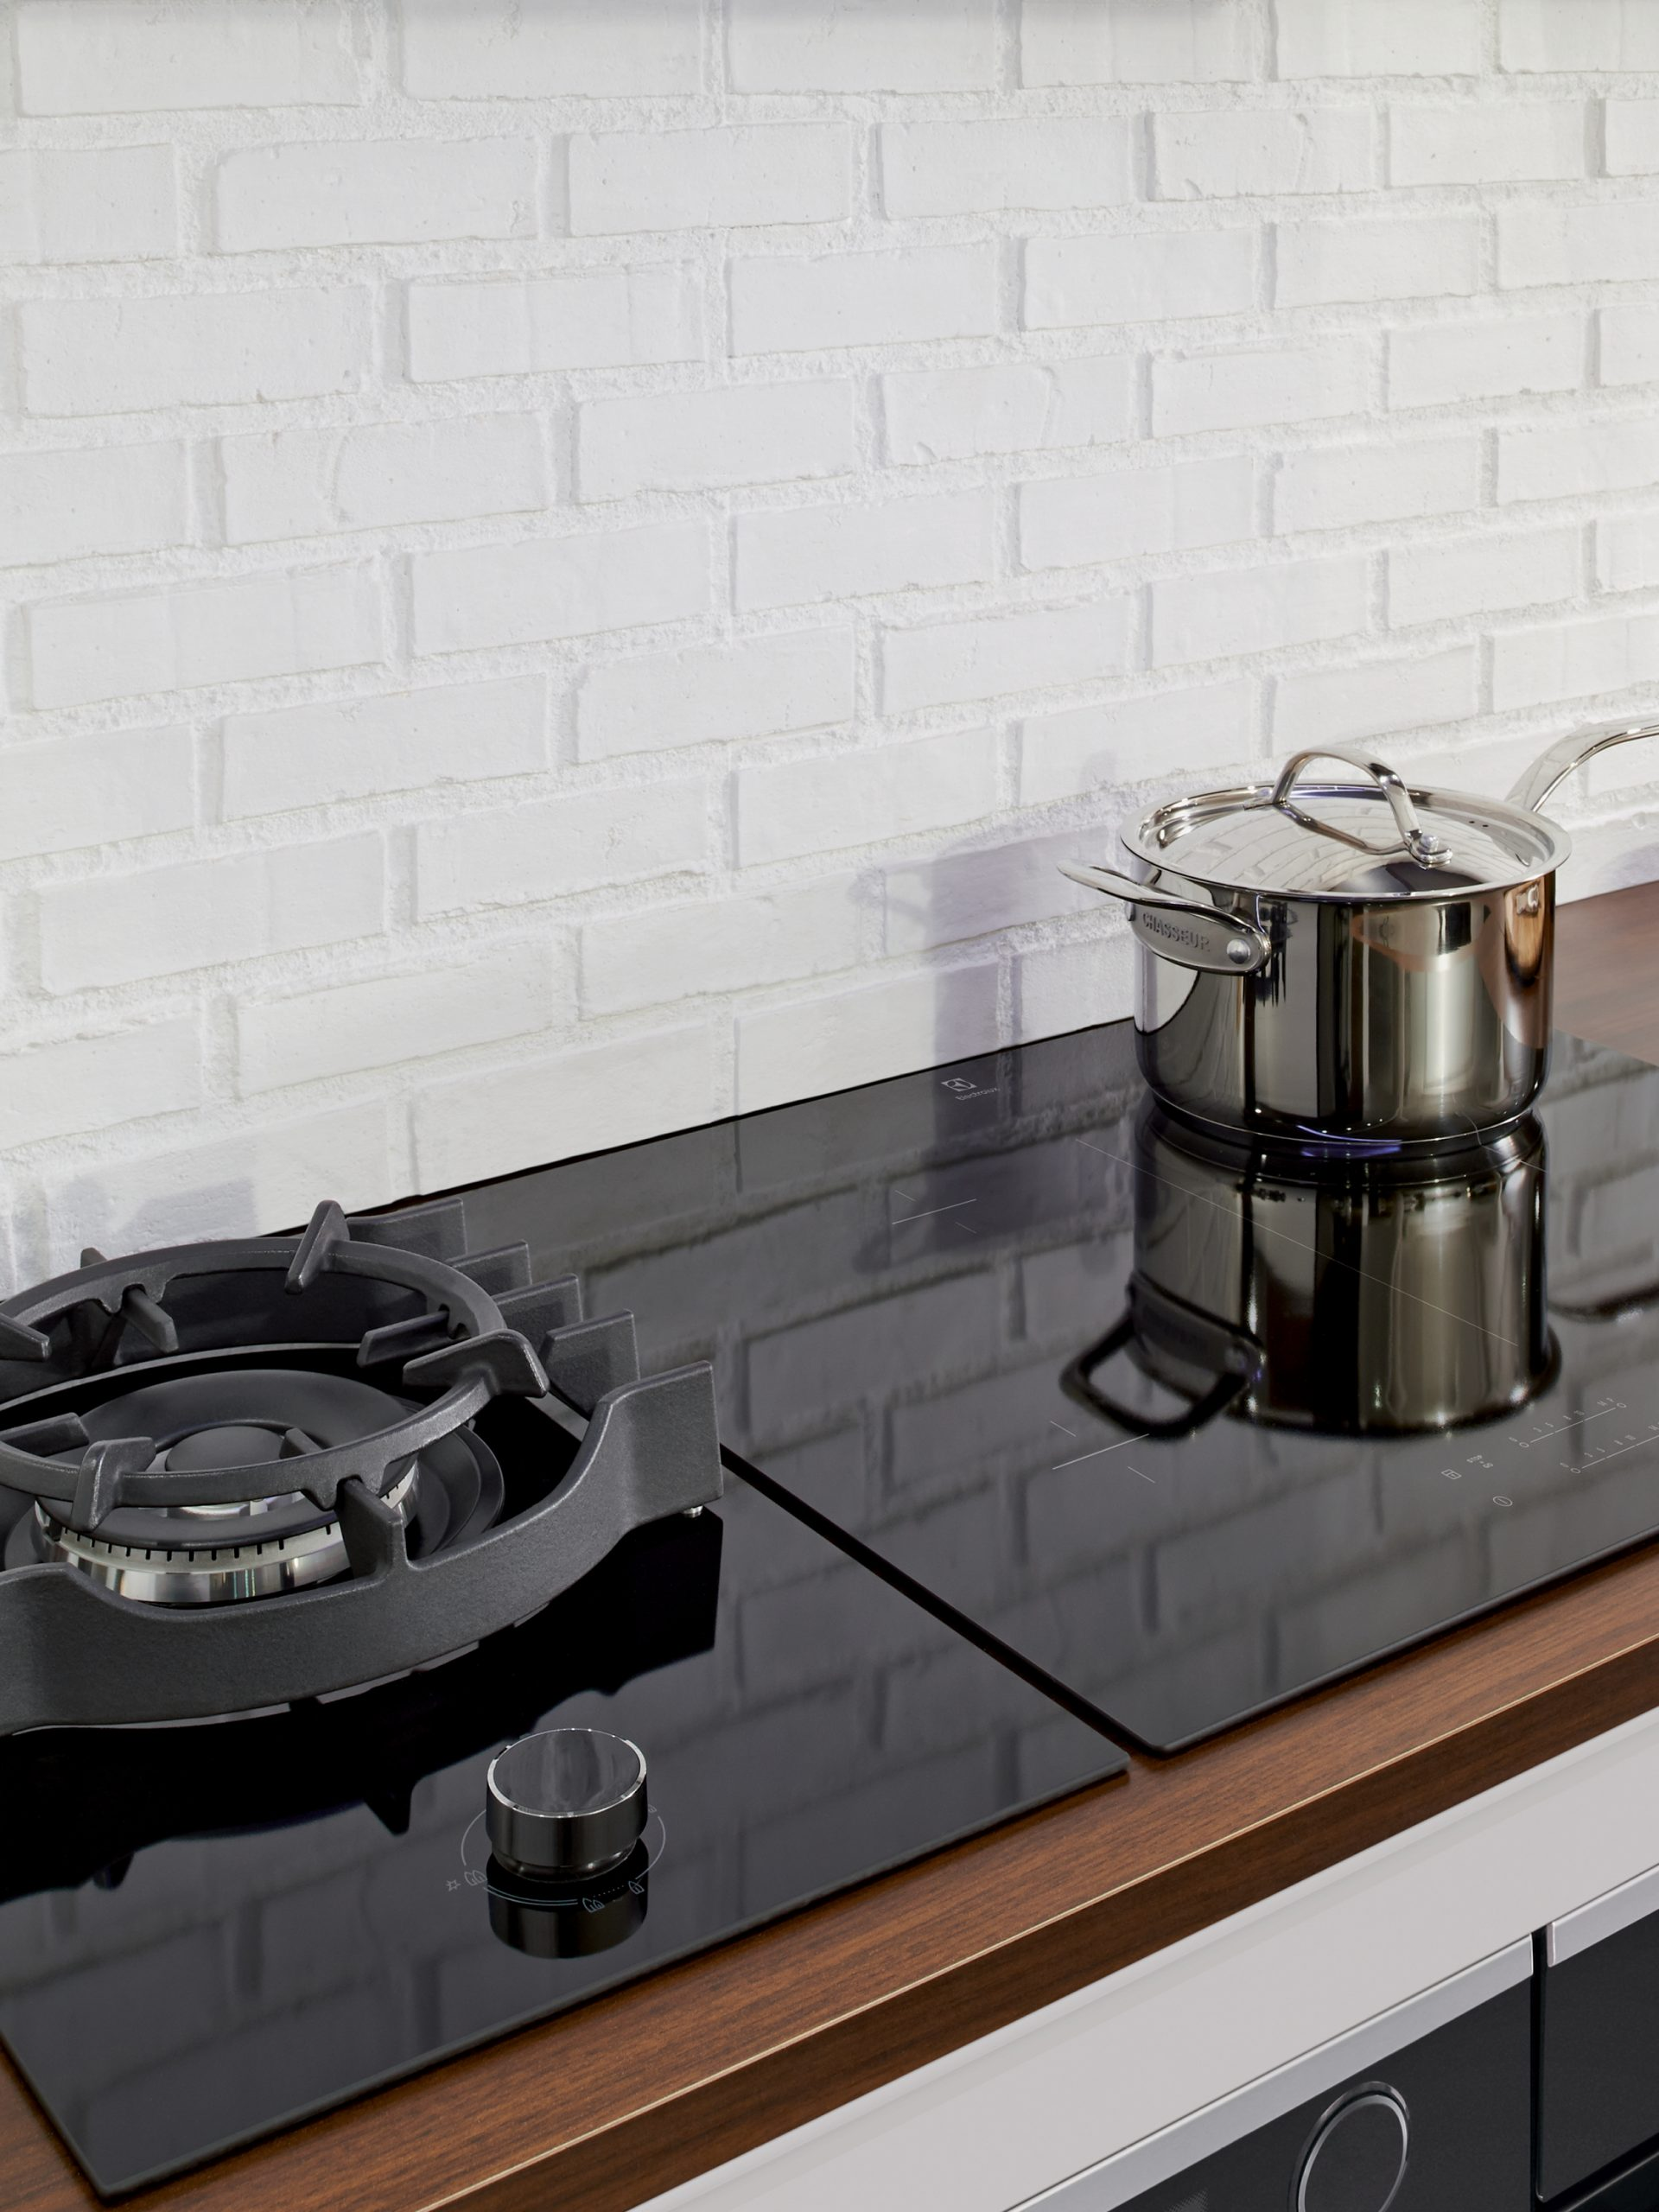 CeramicInductionCooktop_BLOG Feature Image